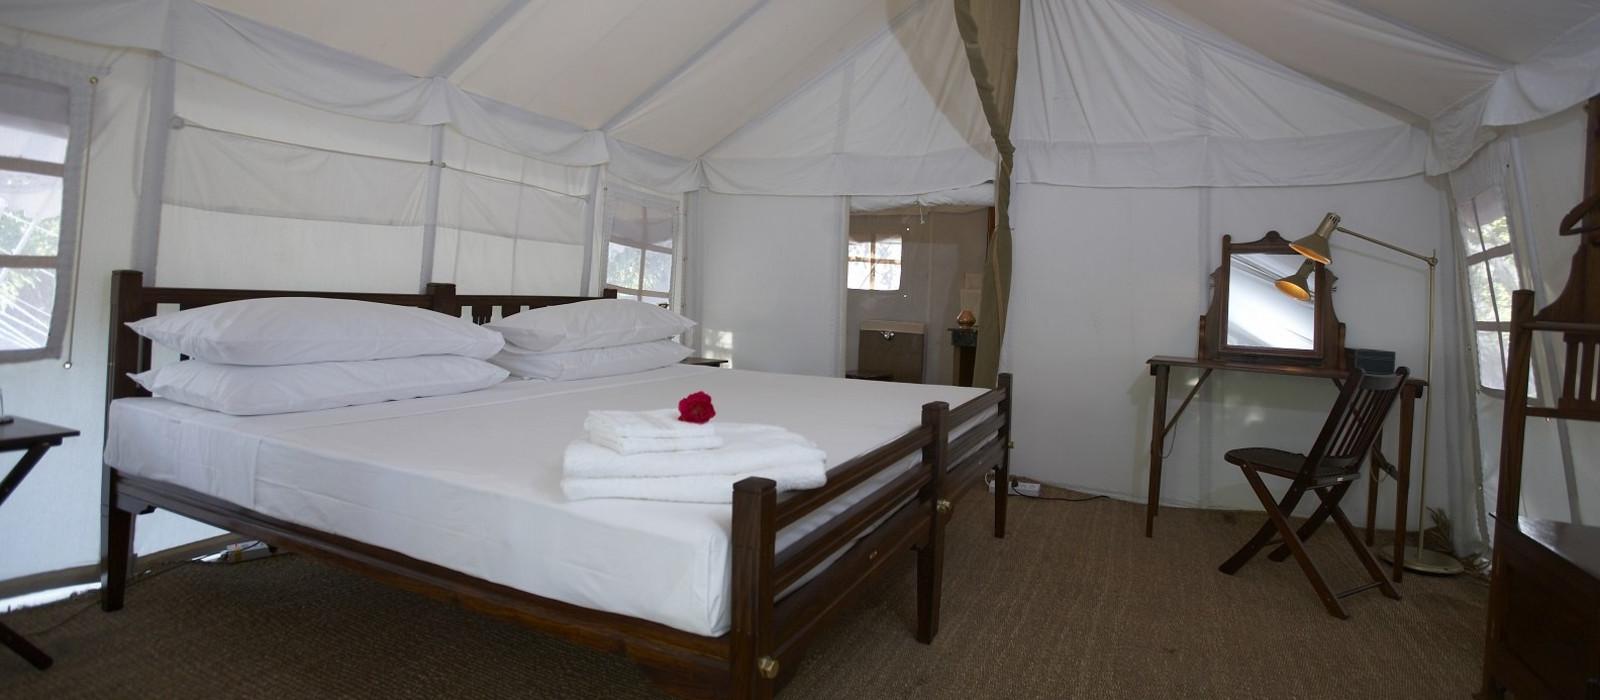 Hotel Sher Bagh Ranthambore Nordindien